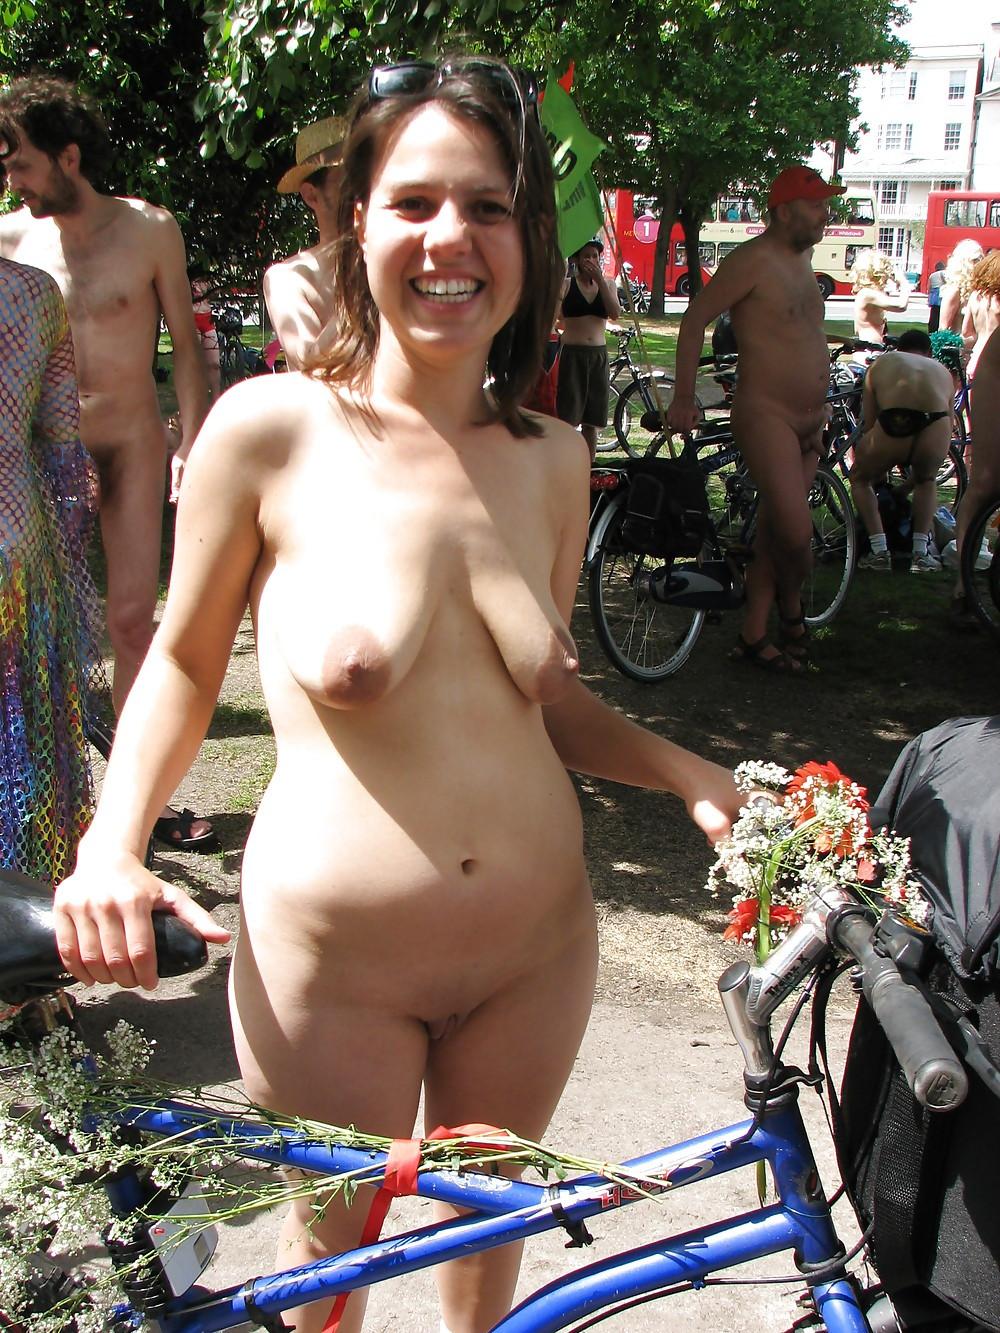 seats bike girls Nude on